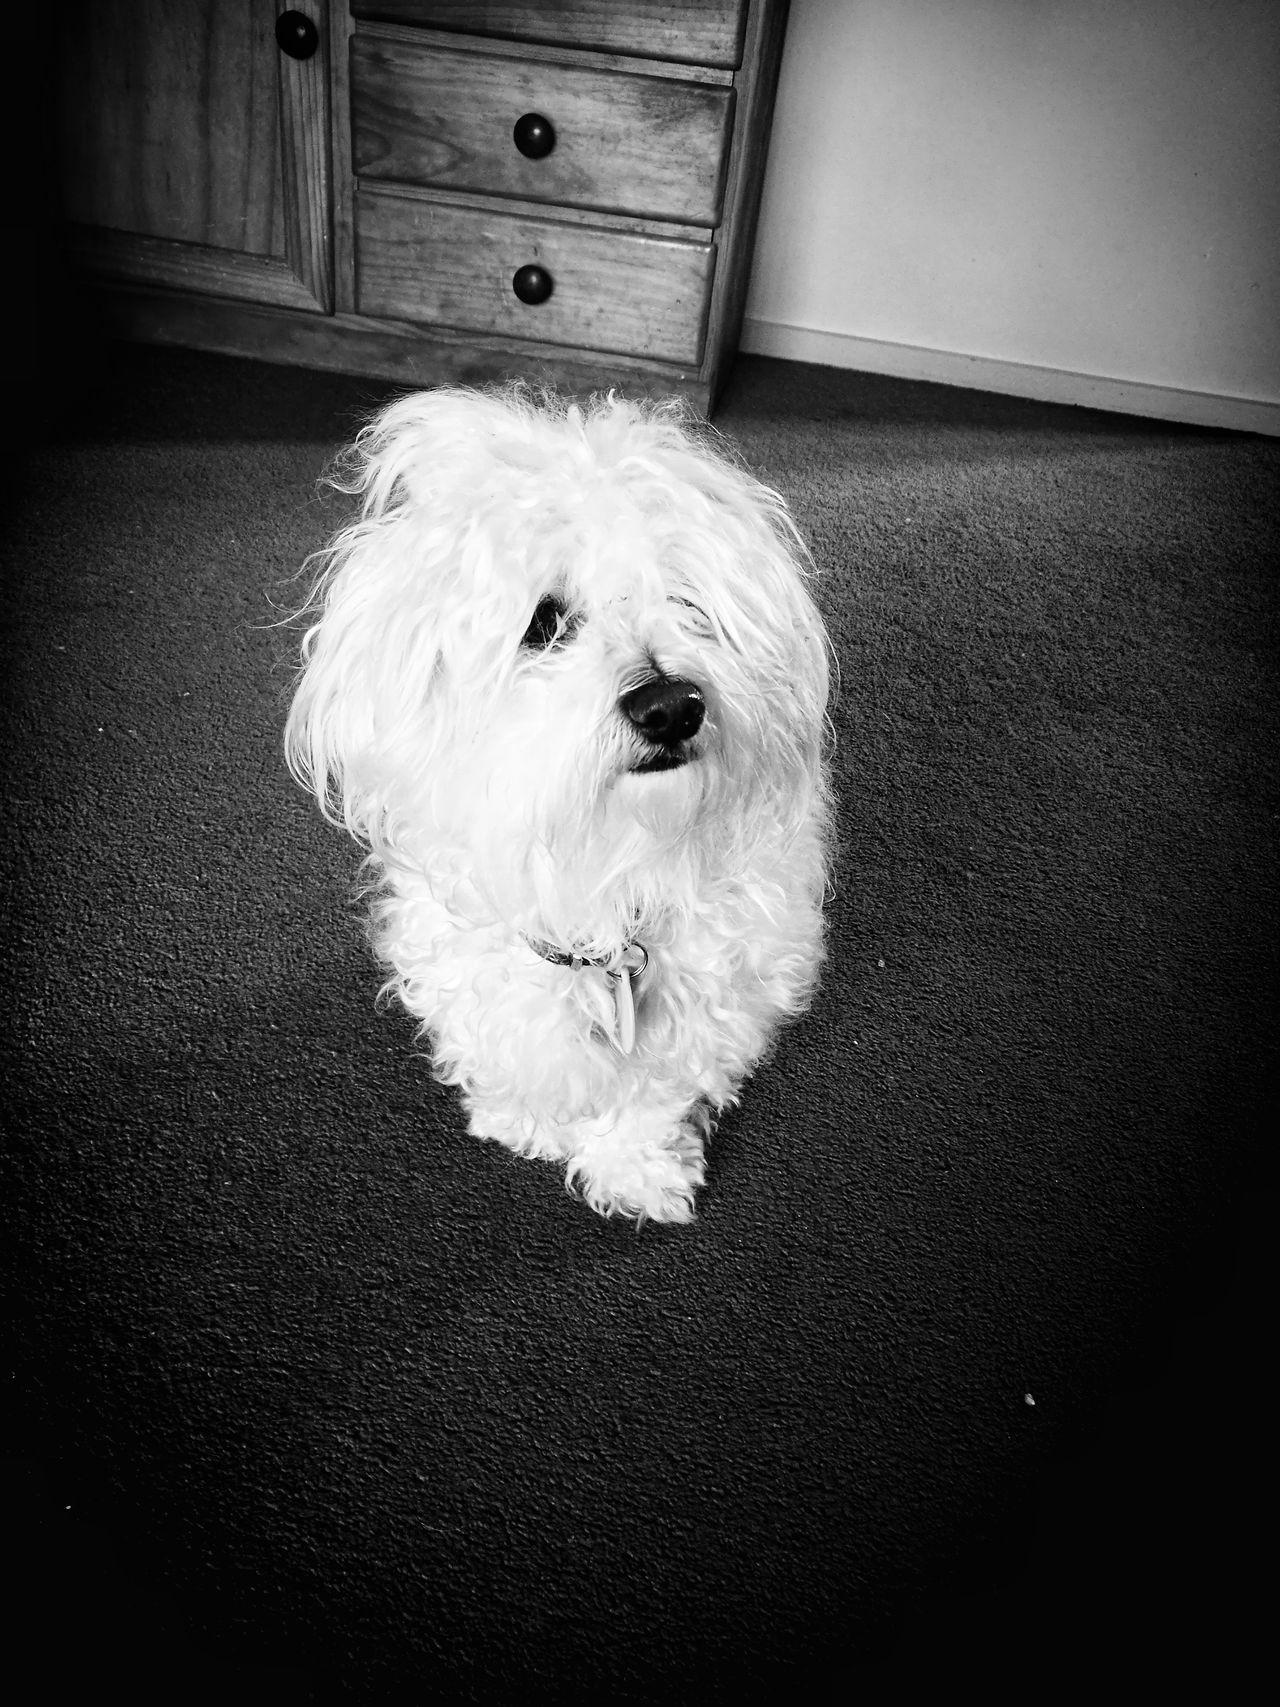 Rosita, my pet model. (Rosita, mi mascota modelo). Dog Pets Indoors  Portrait Maltese Black & White Modelling Perrita  Mascotas En Casa Retrato Maltes Blanco & Negro  Modelando The Portraitist - 2017 EyeEm Awards BYOPaper!